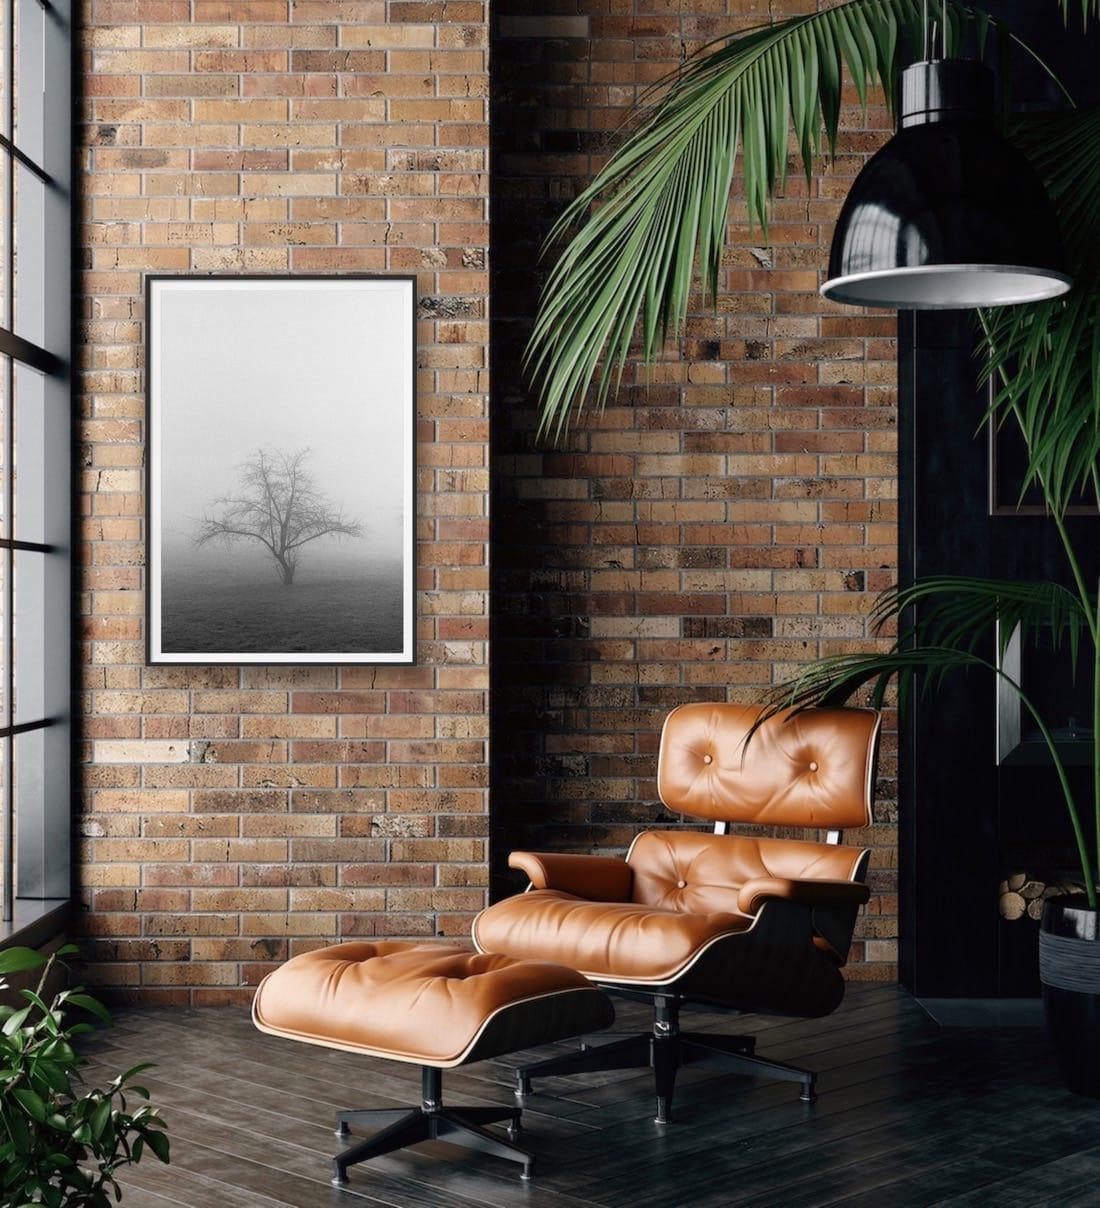 Black-and-white-fine-art-film-photography-wall-decor-by-emerging-artist-Studio-L-photographer-Laura-Schneider-_4910